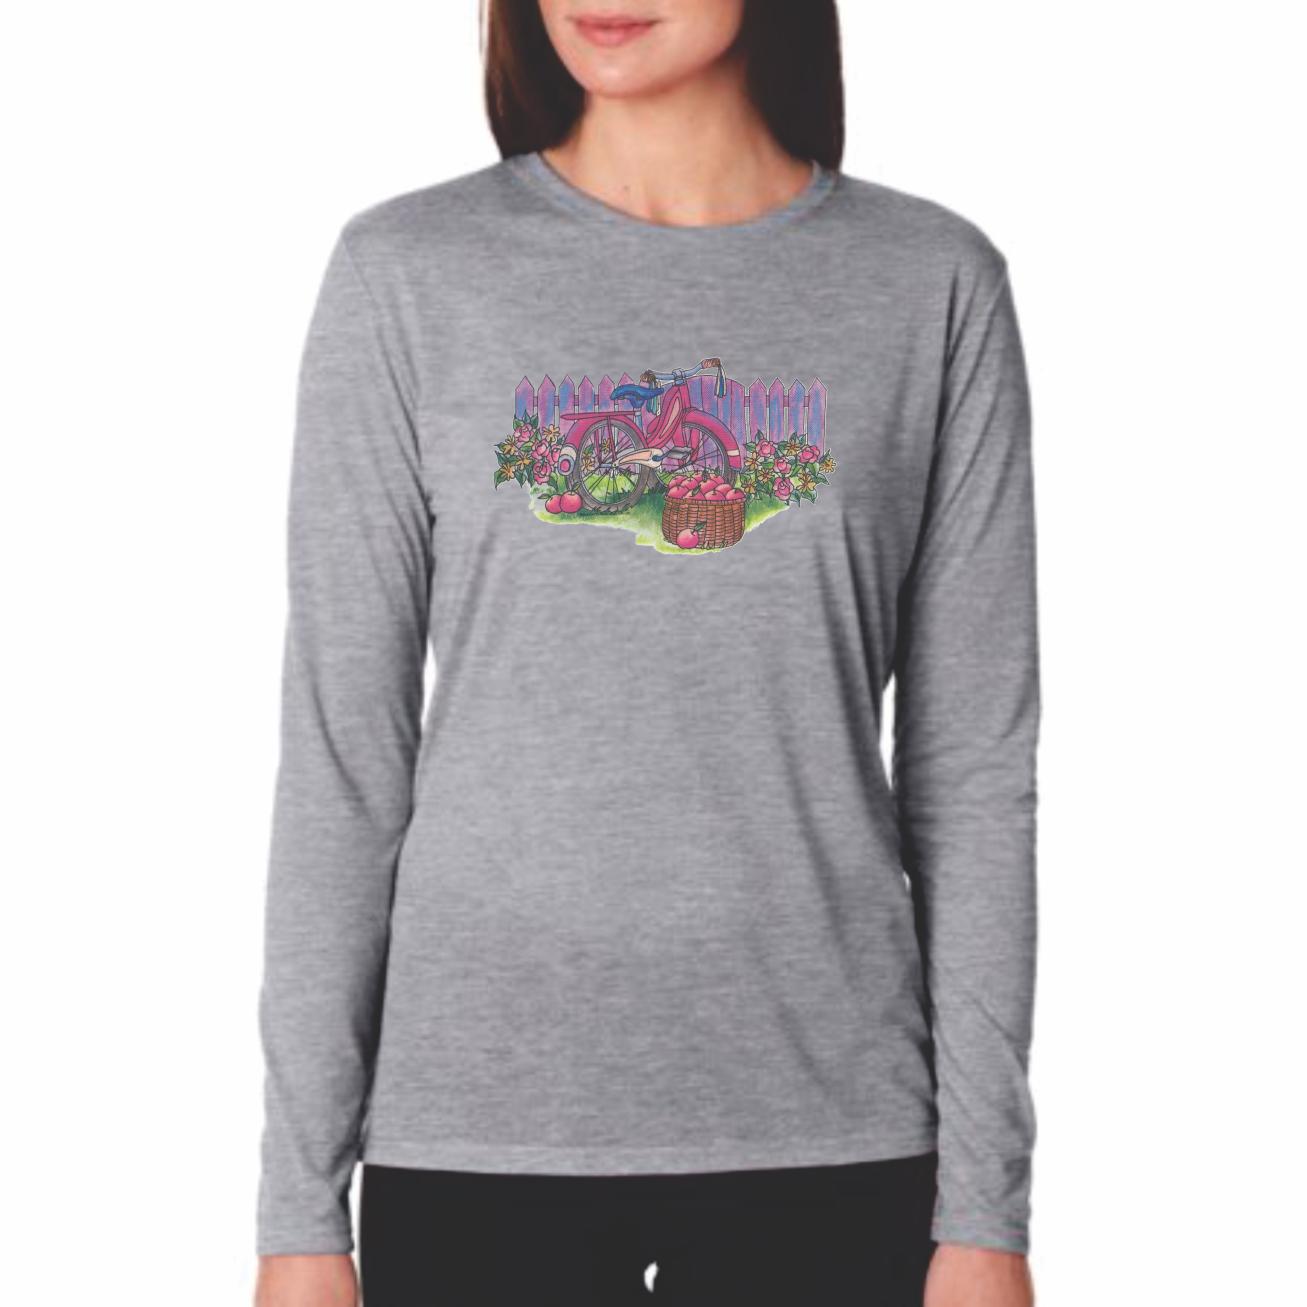 Jurassic Park Electric Fence Sign Adult Crewneck Sweatshirt